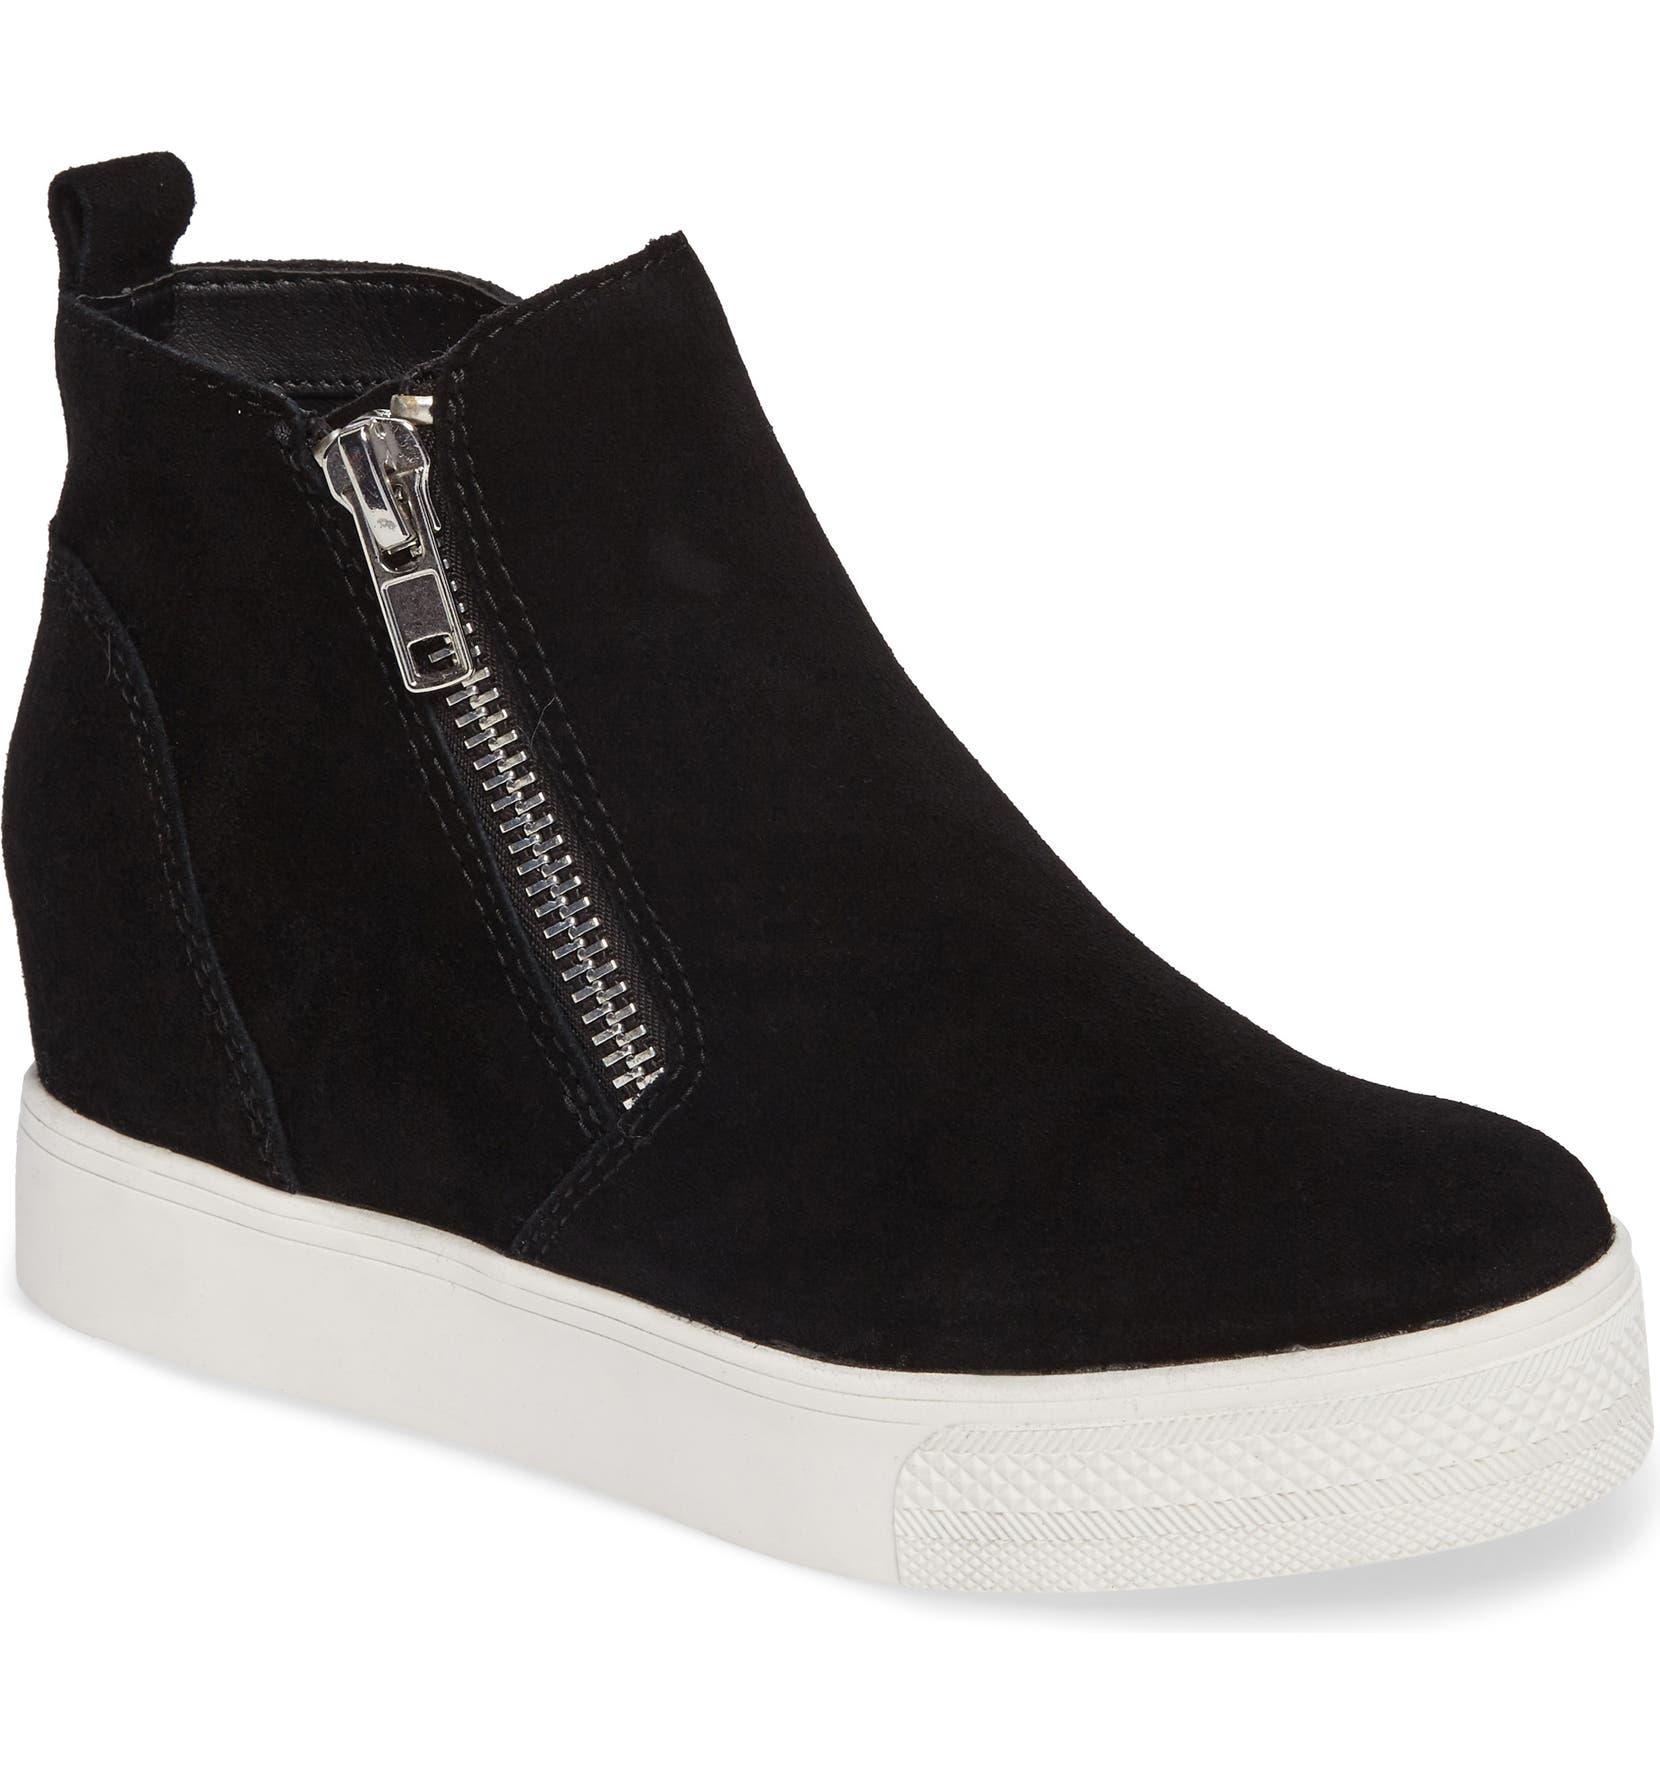 cf11061fde5 Wedgie High Top Platform Sneaker